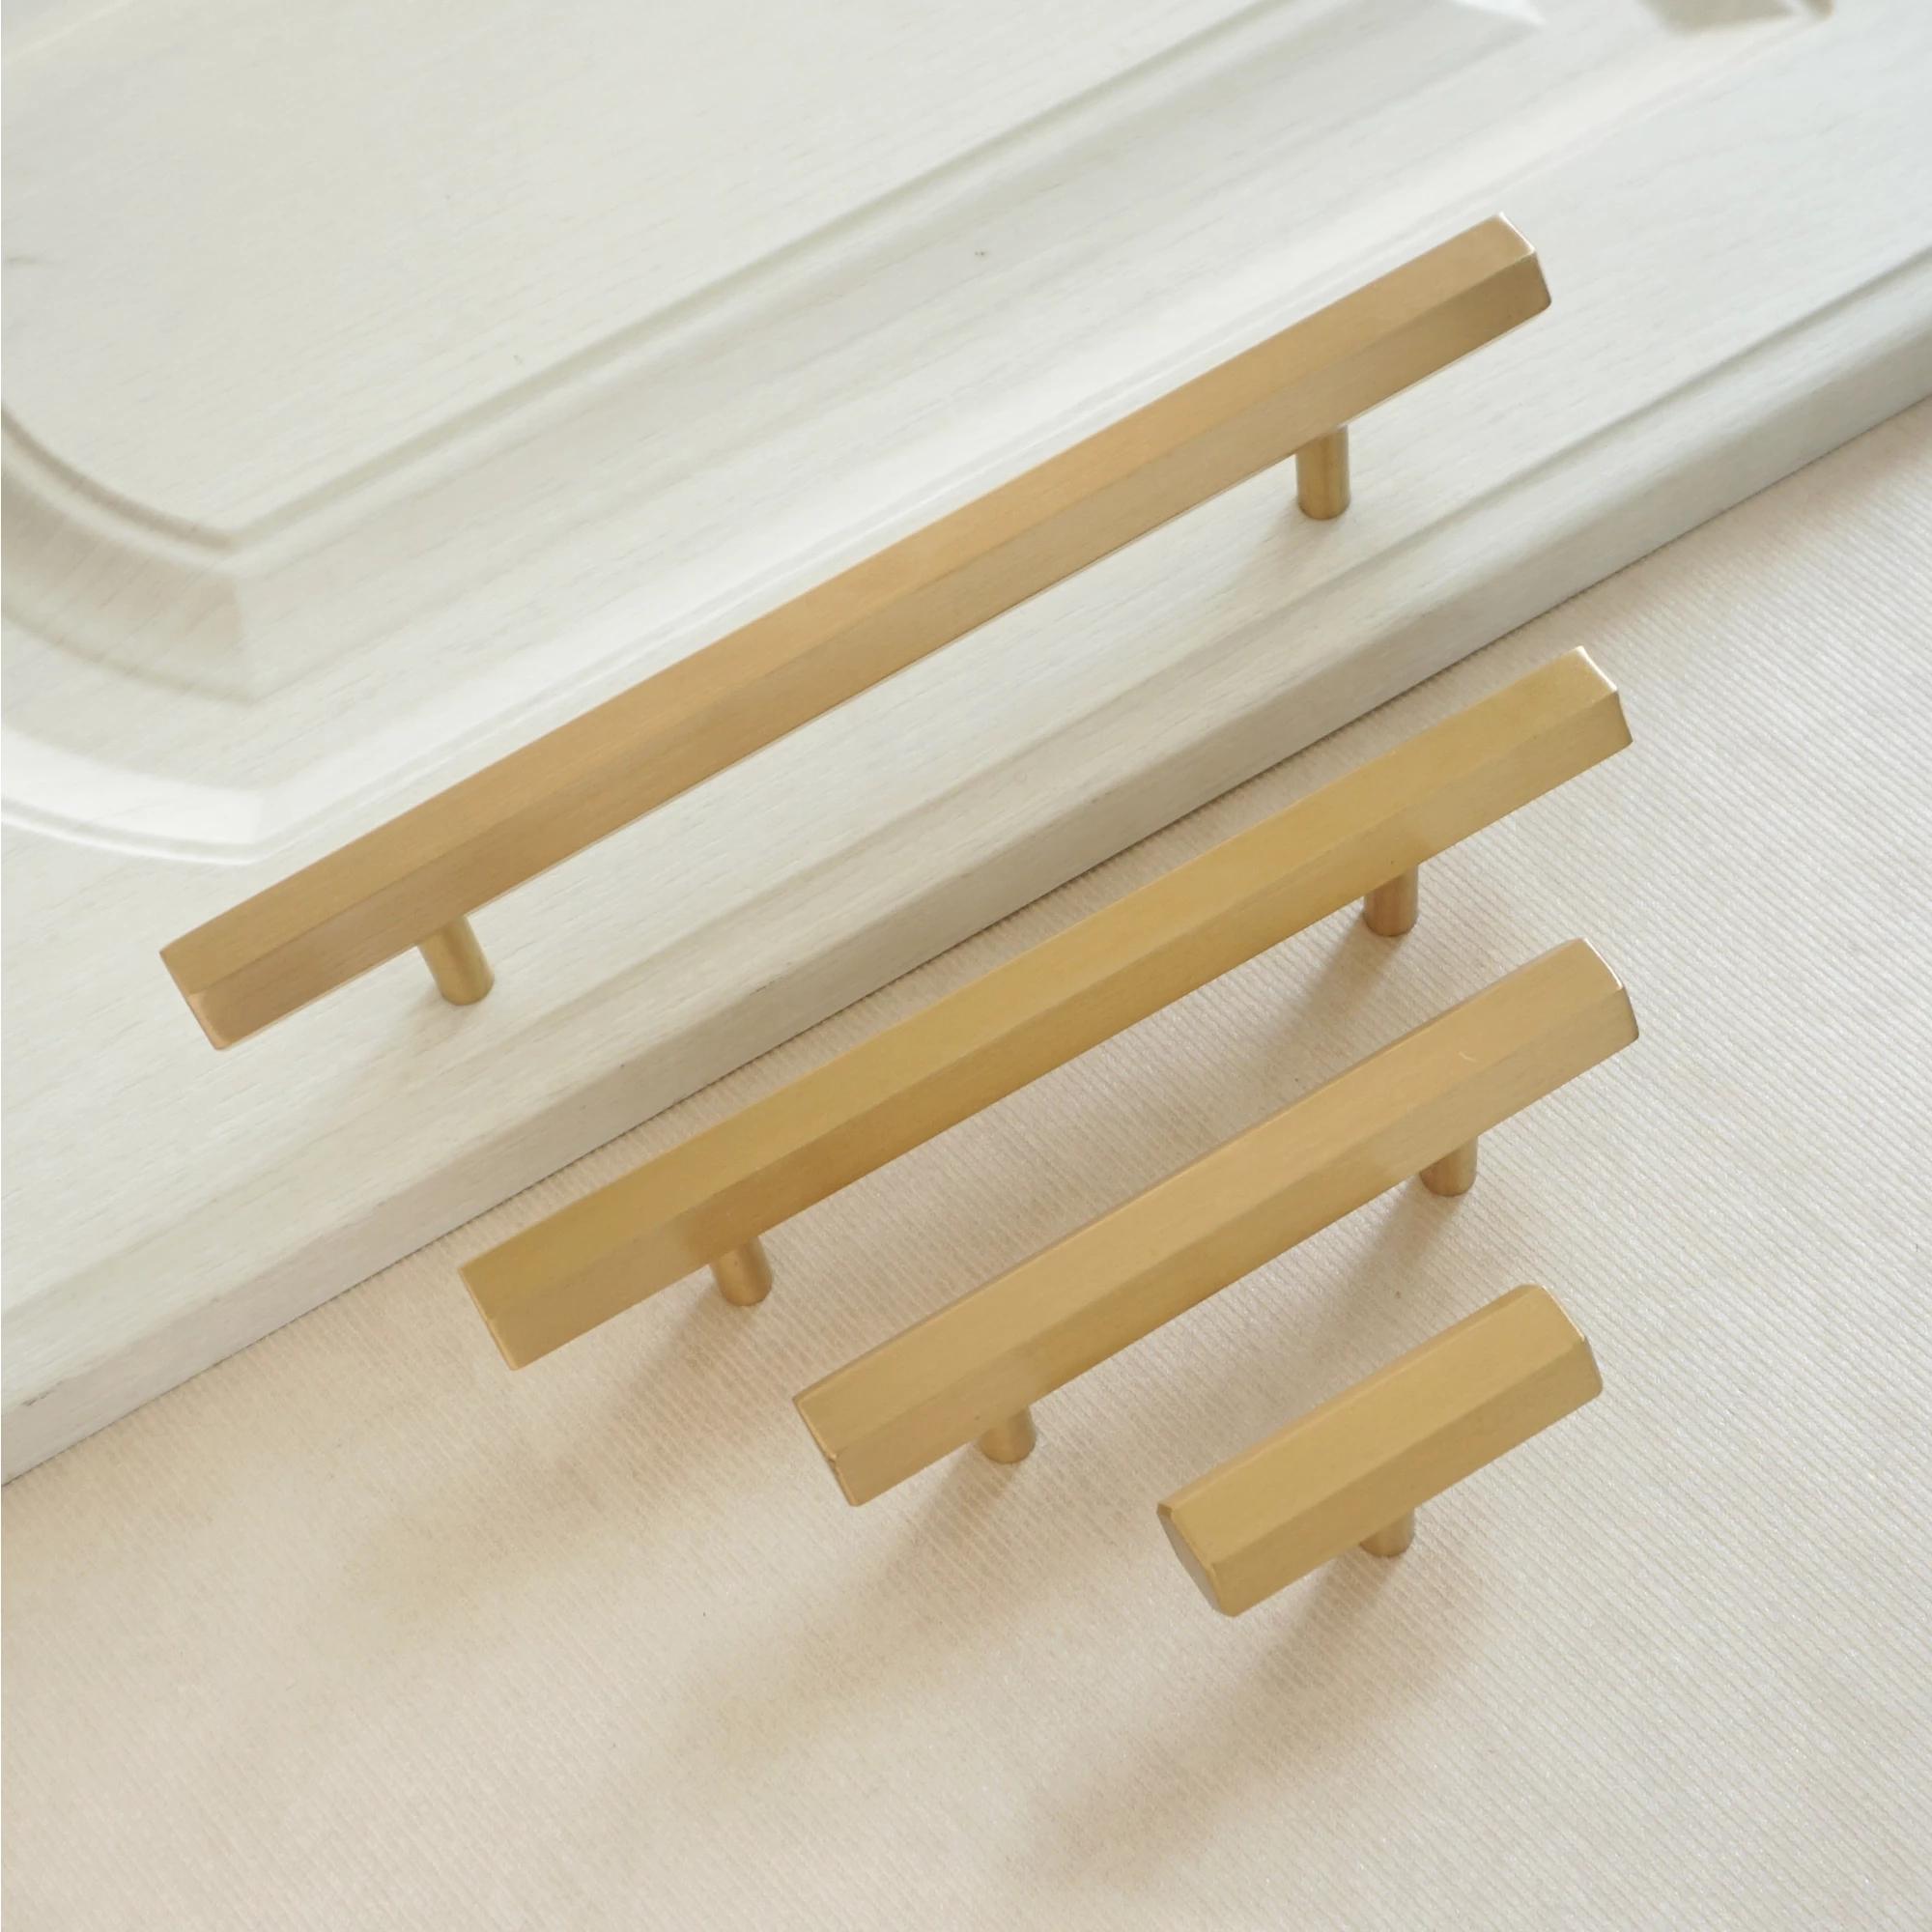 2.5\'\' 3.75\'\' 5\'\' Brushed Brass Handles Knob Hexagon Pull Knob Kitchen Cabinet Handle Drawer Knob Pull Handles Modern Style